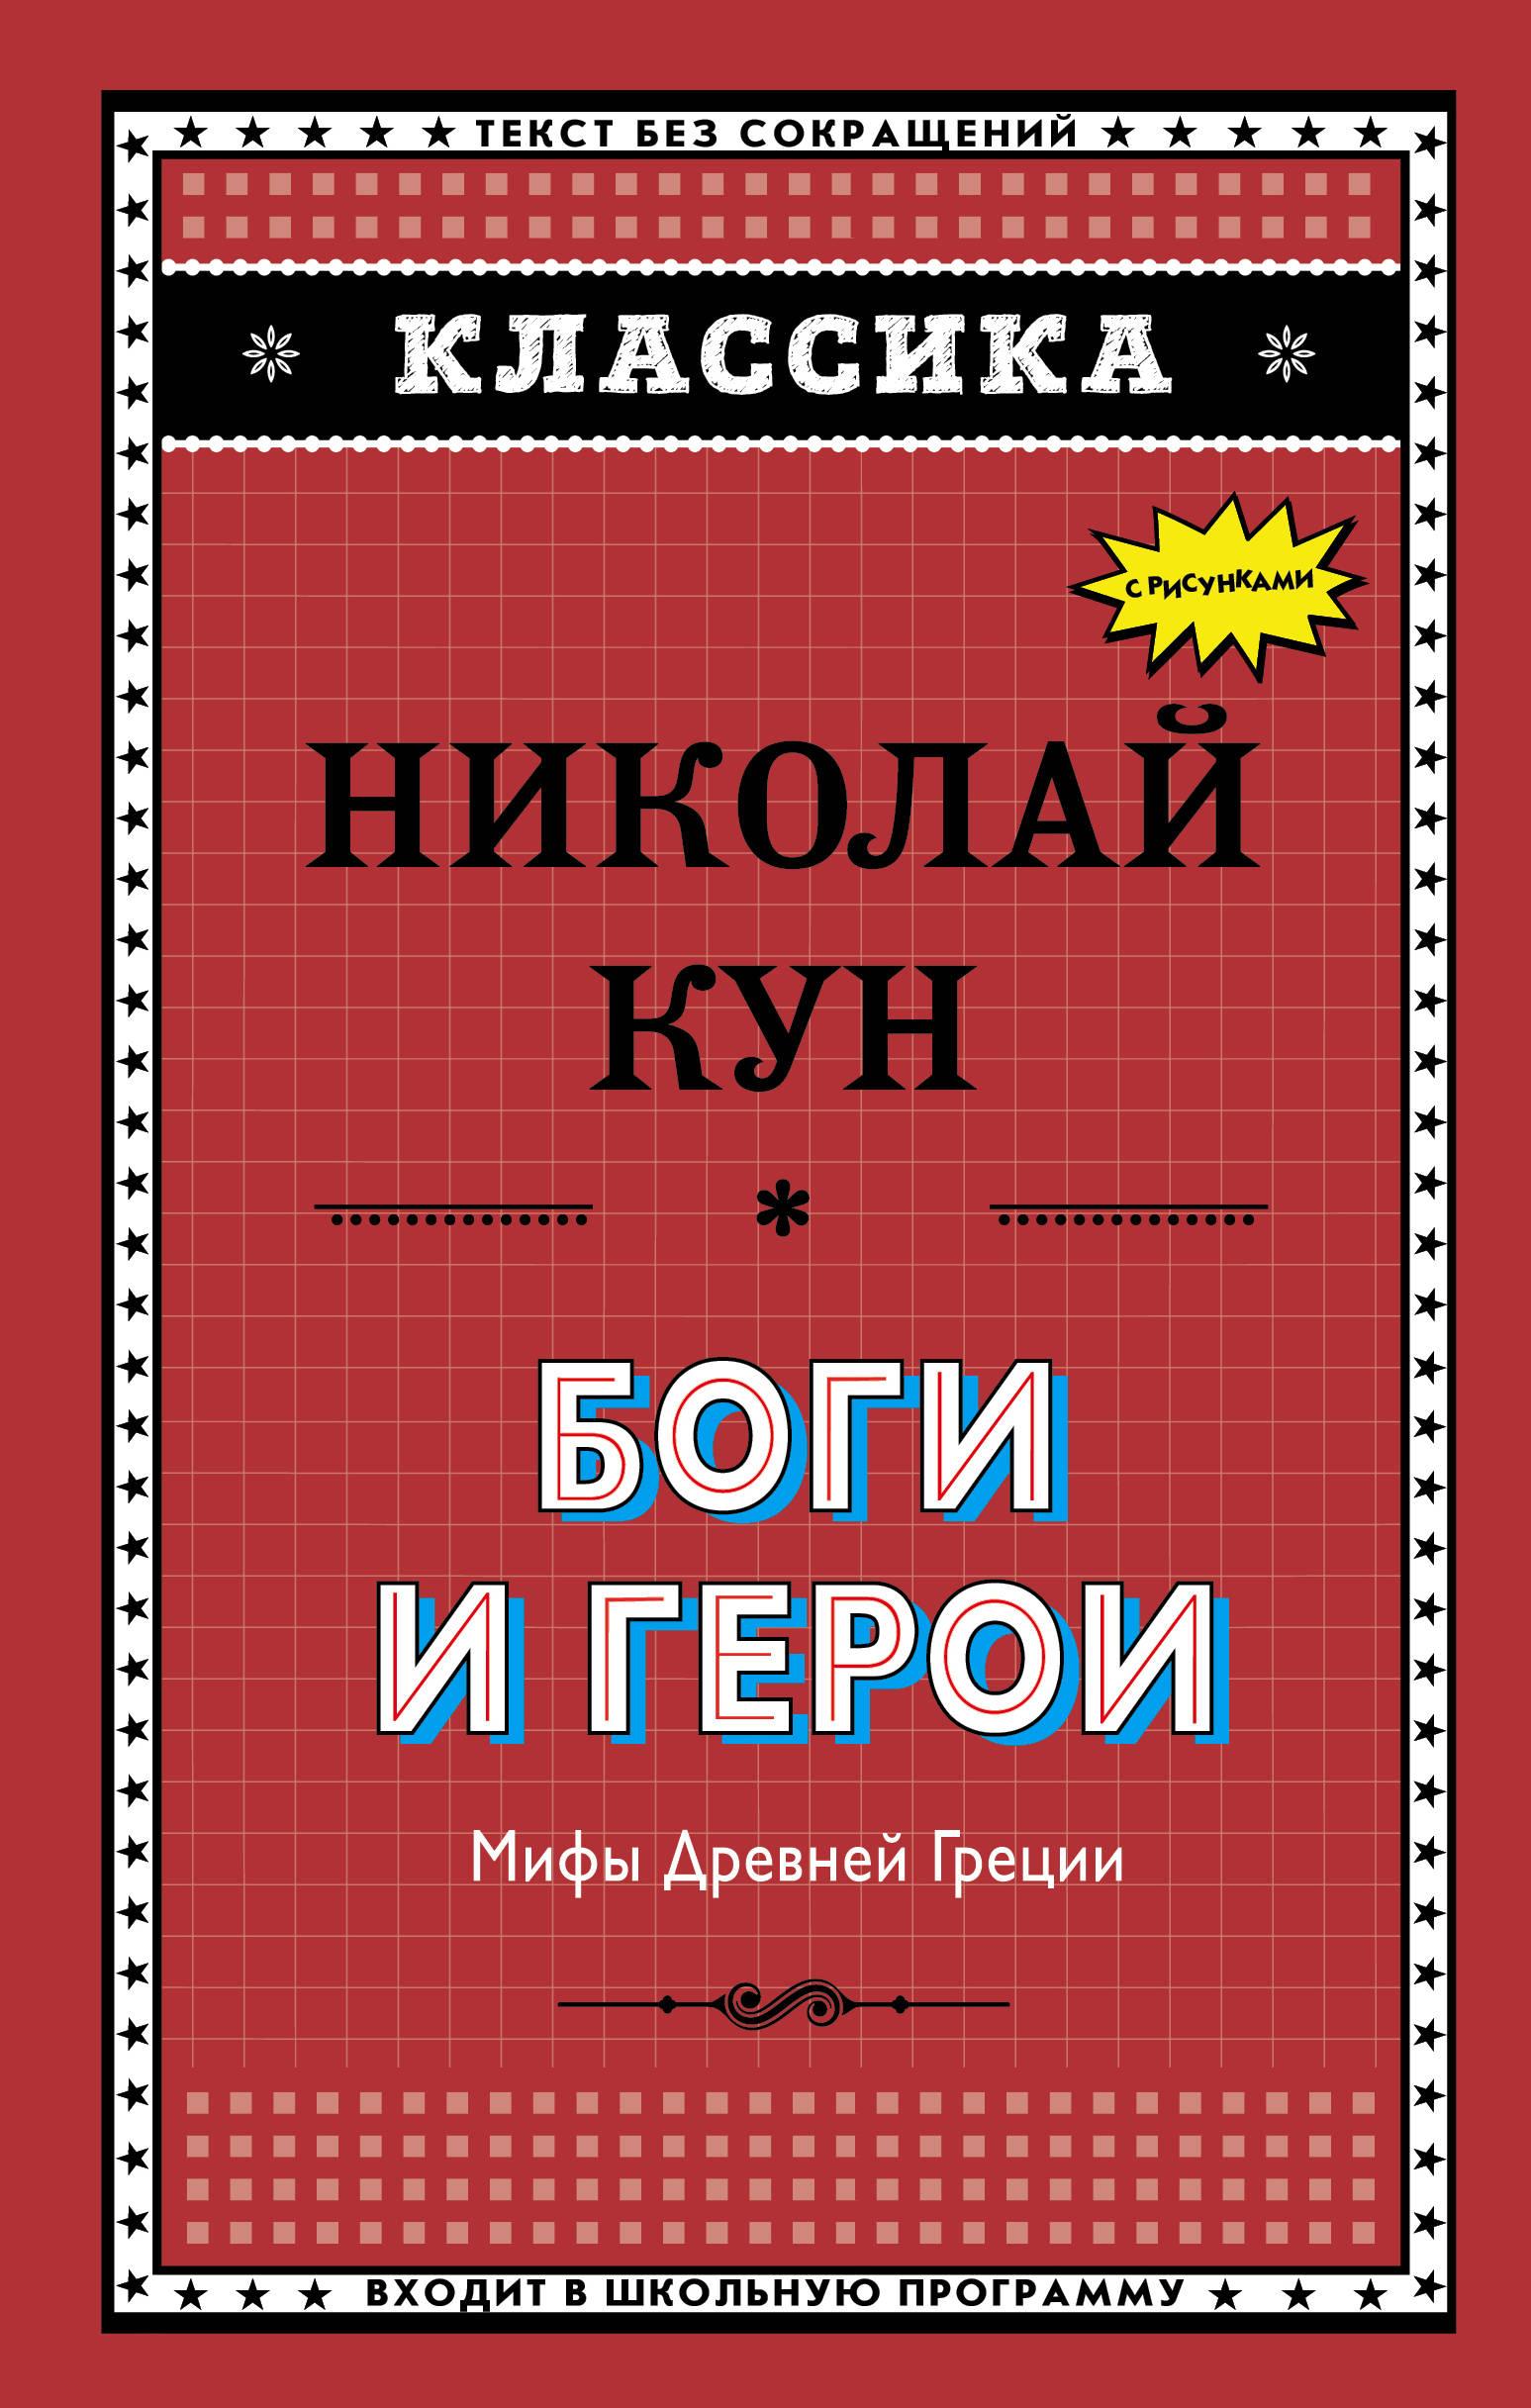 Николай Кун Боги и герои. Мифы Древней Греции